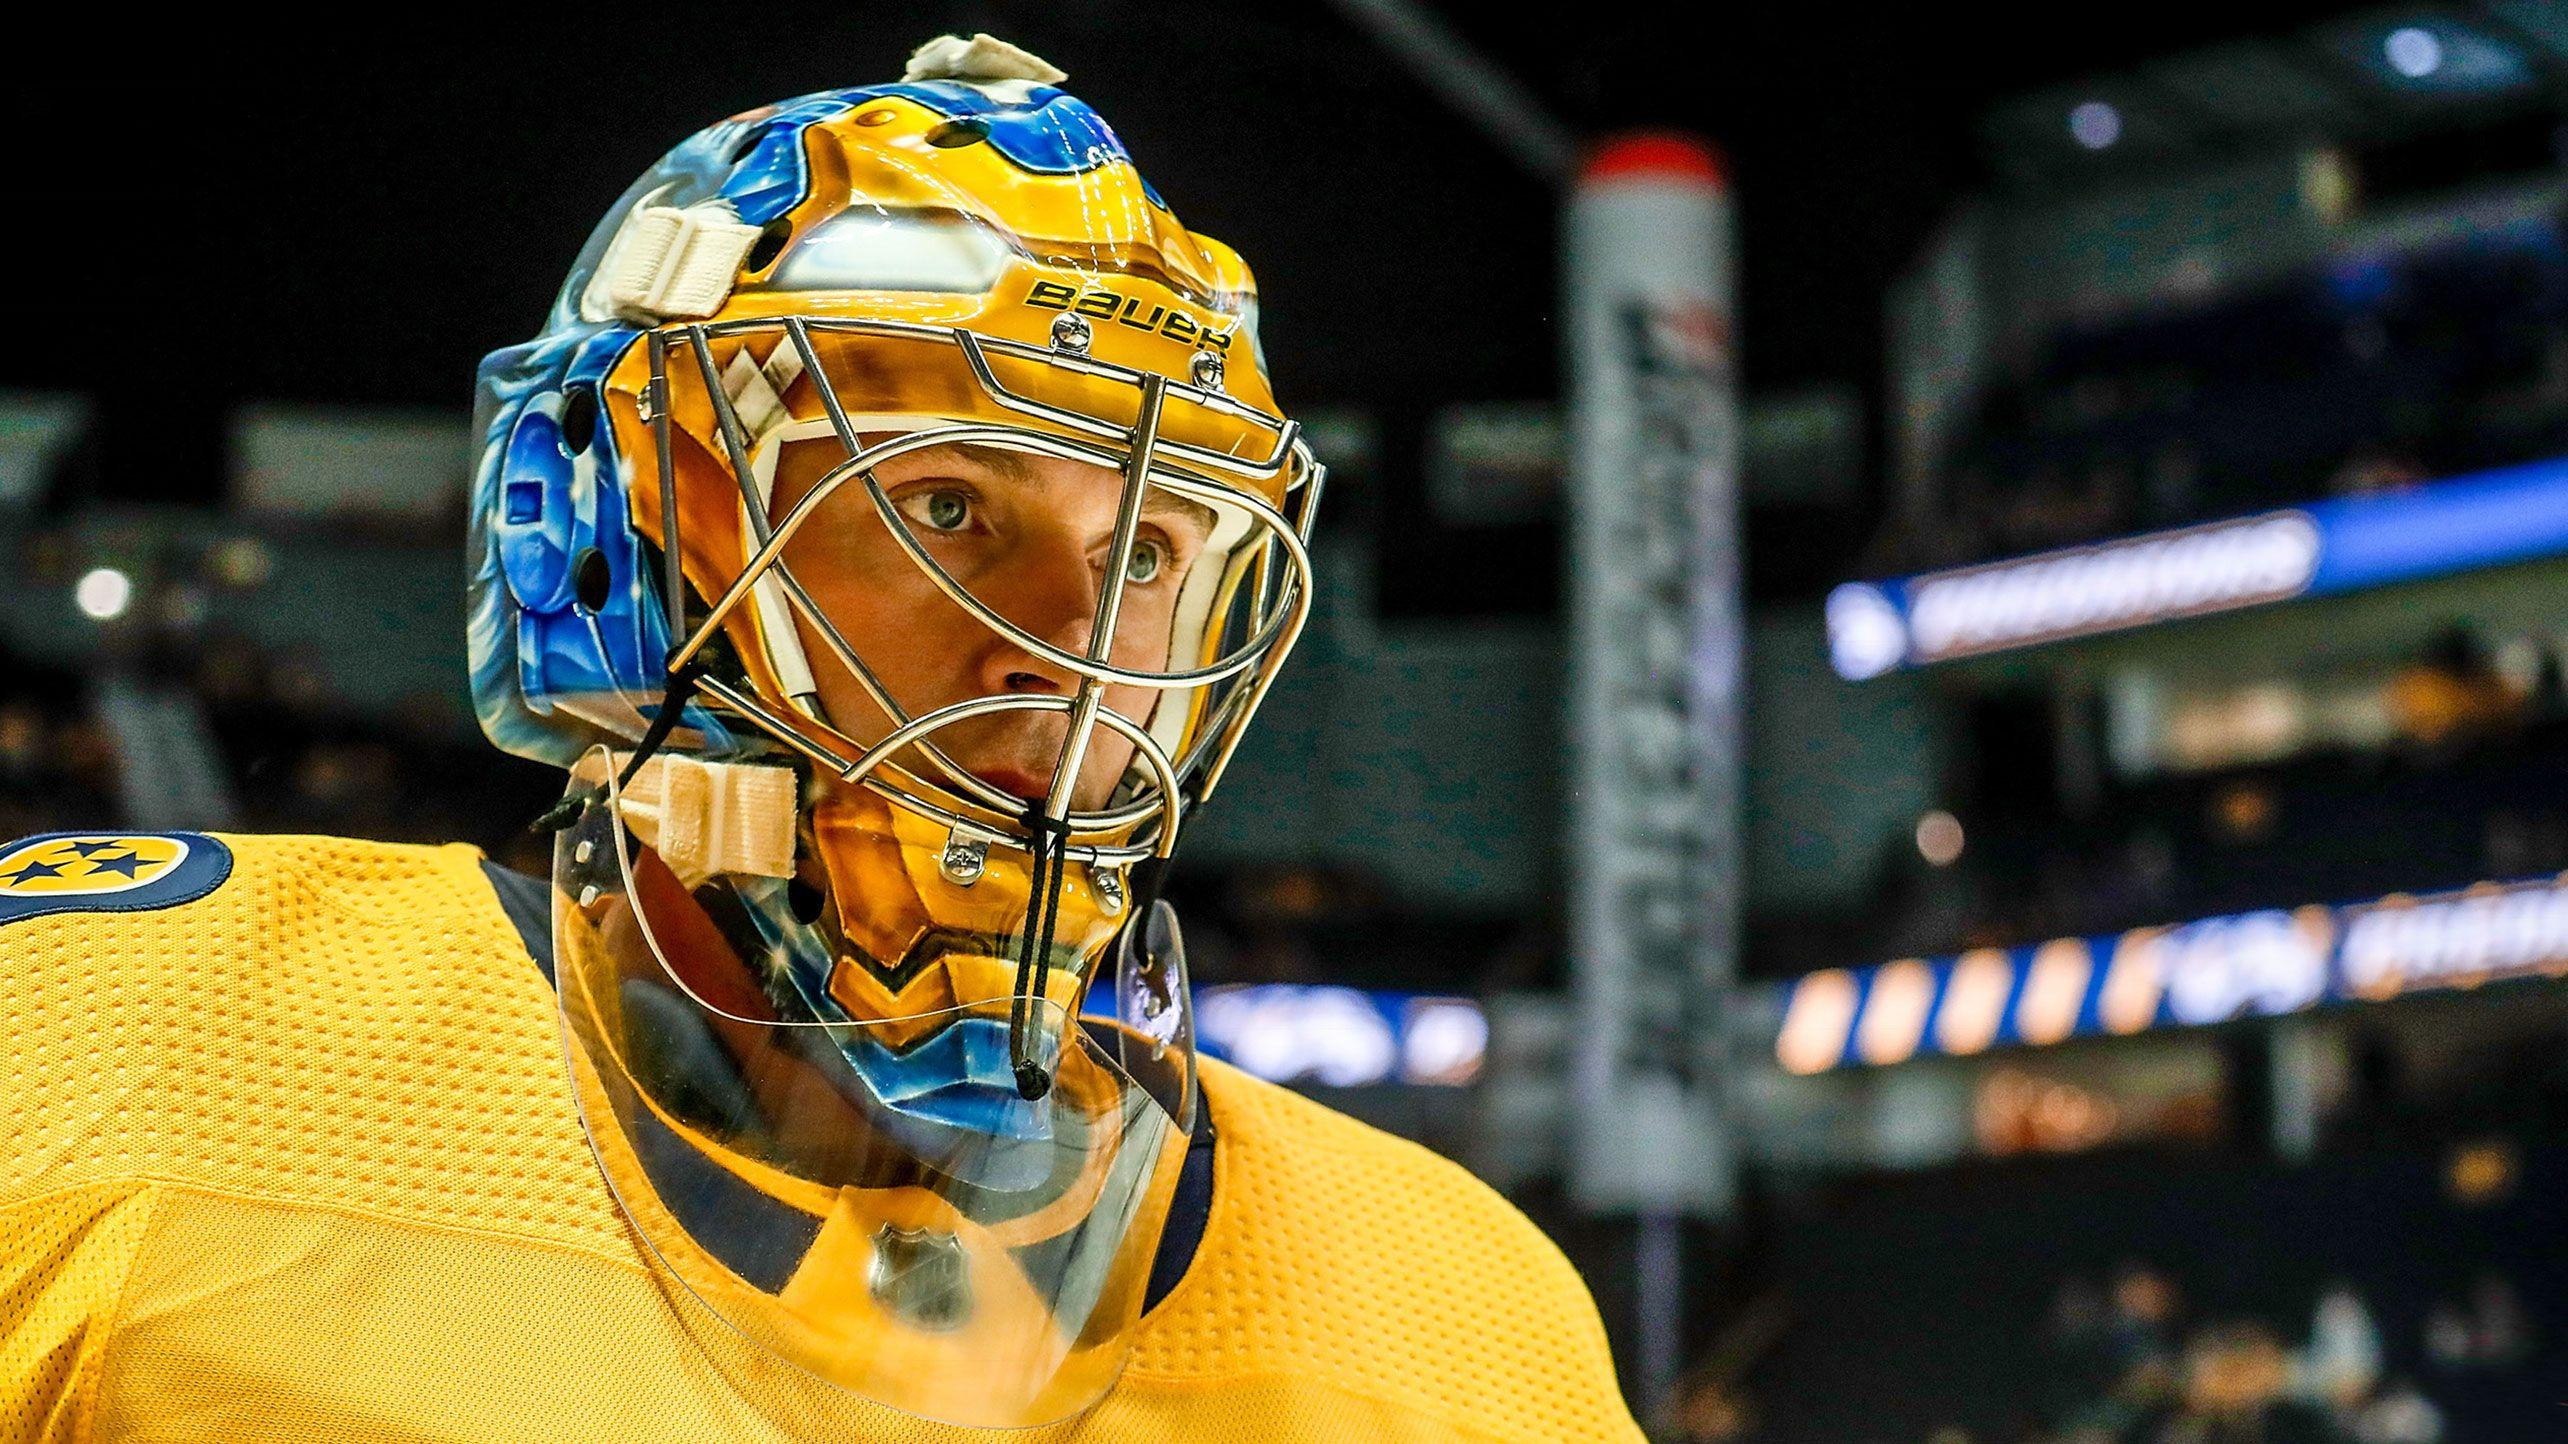 Rinne Unveils New Mask For 2018 19 Season Goalie Mask Nashville Predators Hockey Airsoft